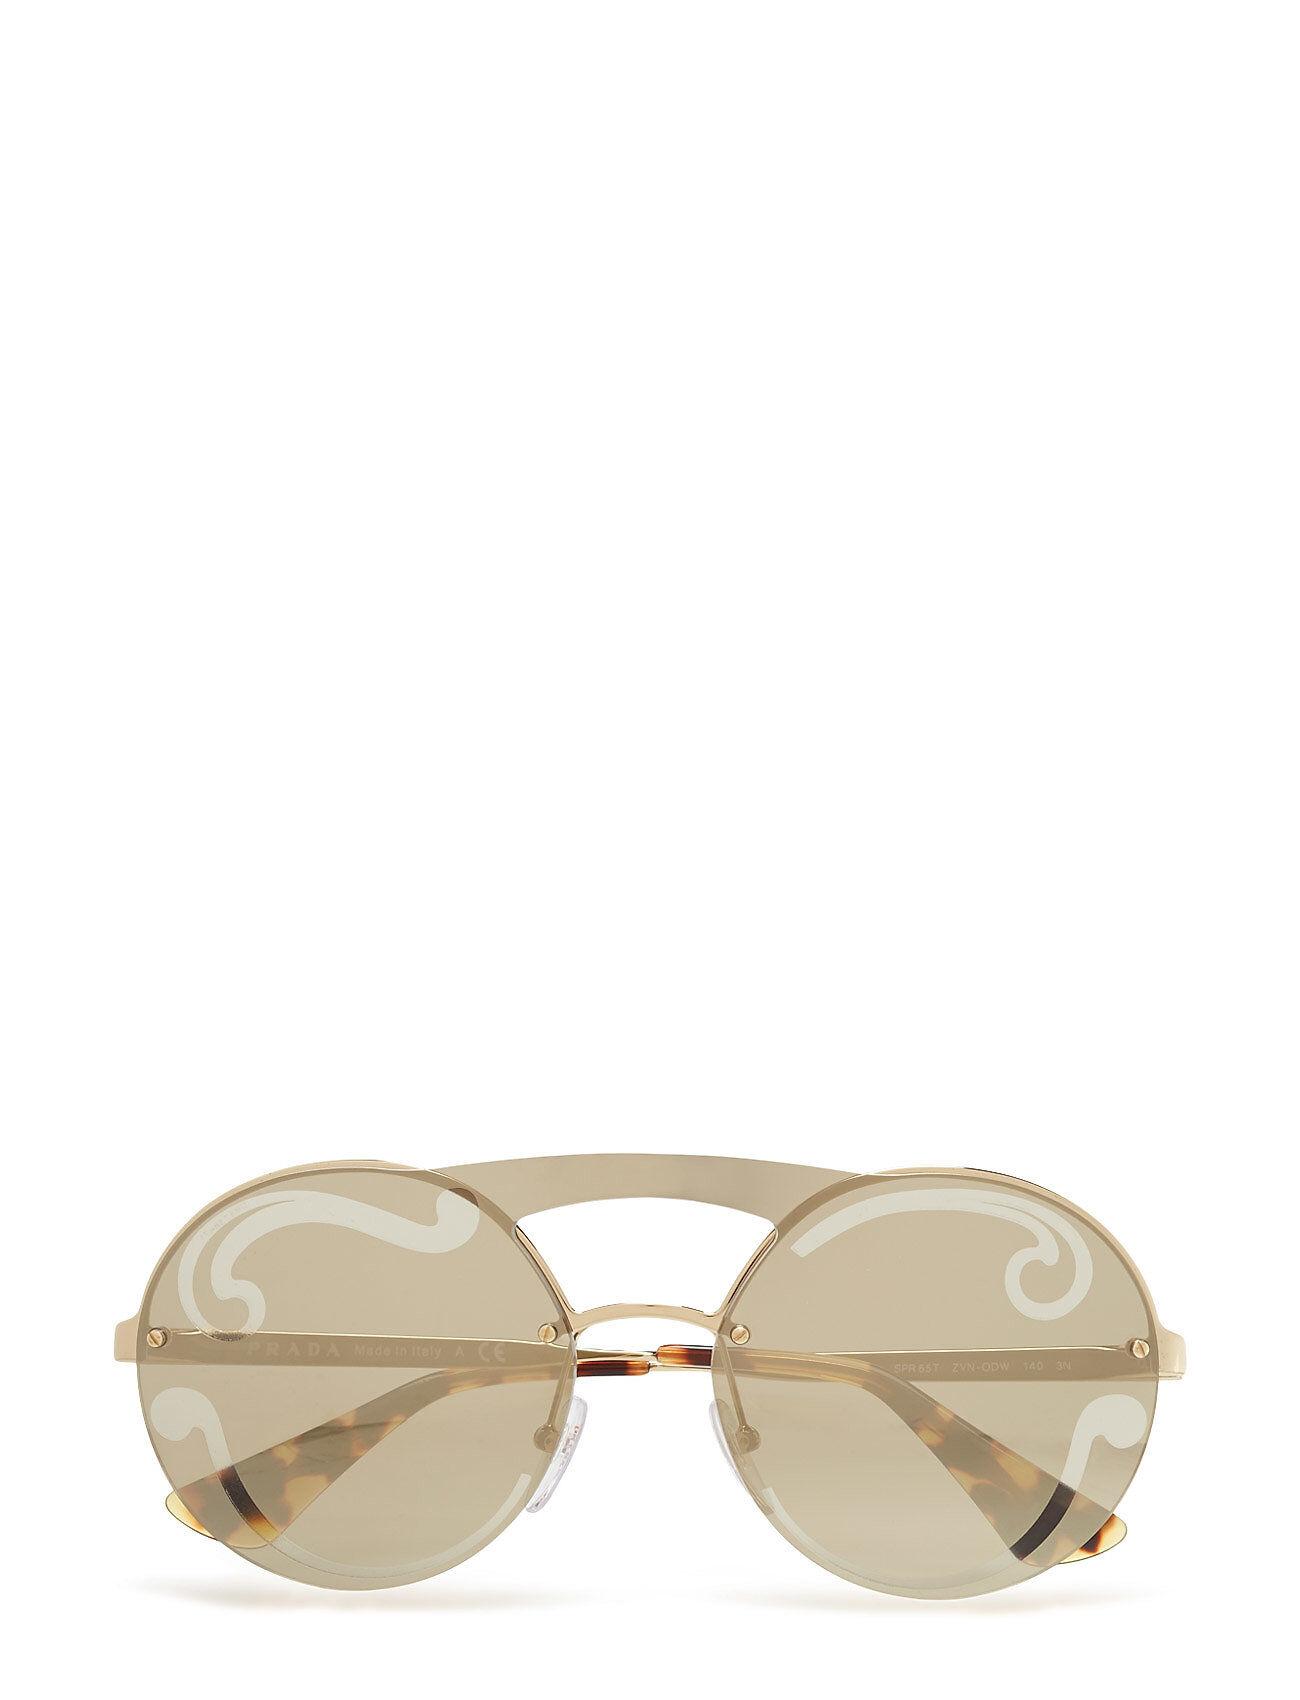 Image of Prada Sunglasses Not Defined Aurinkolasit Kulta Prada Sunglasses